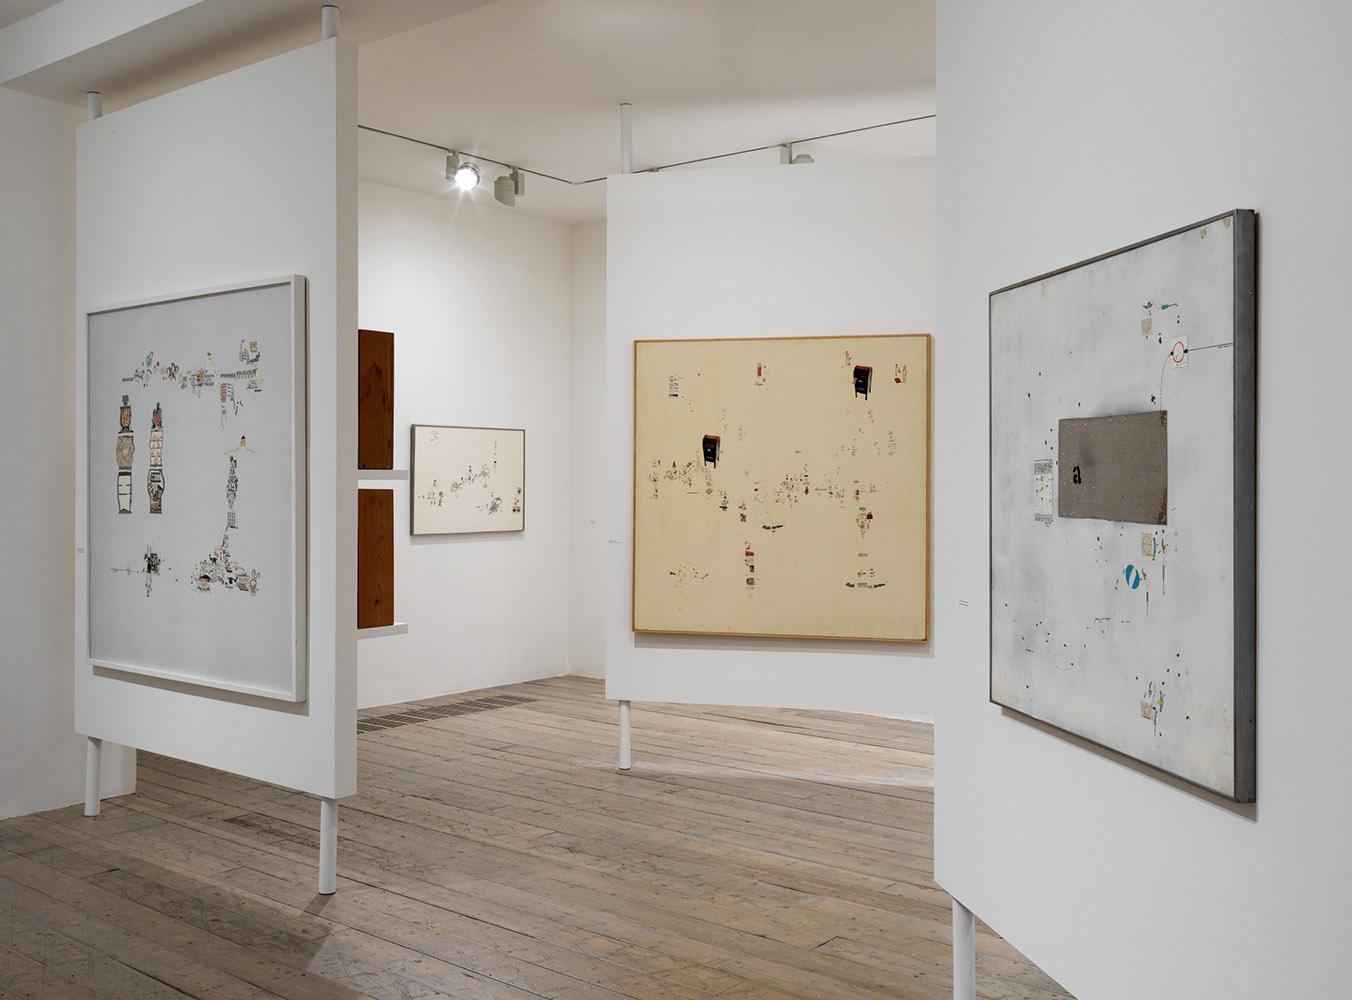 Gianfranco Baruchello- Incidents of Lesser Account installation